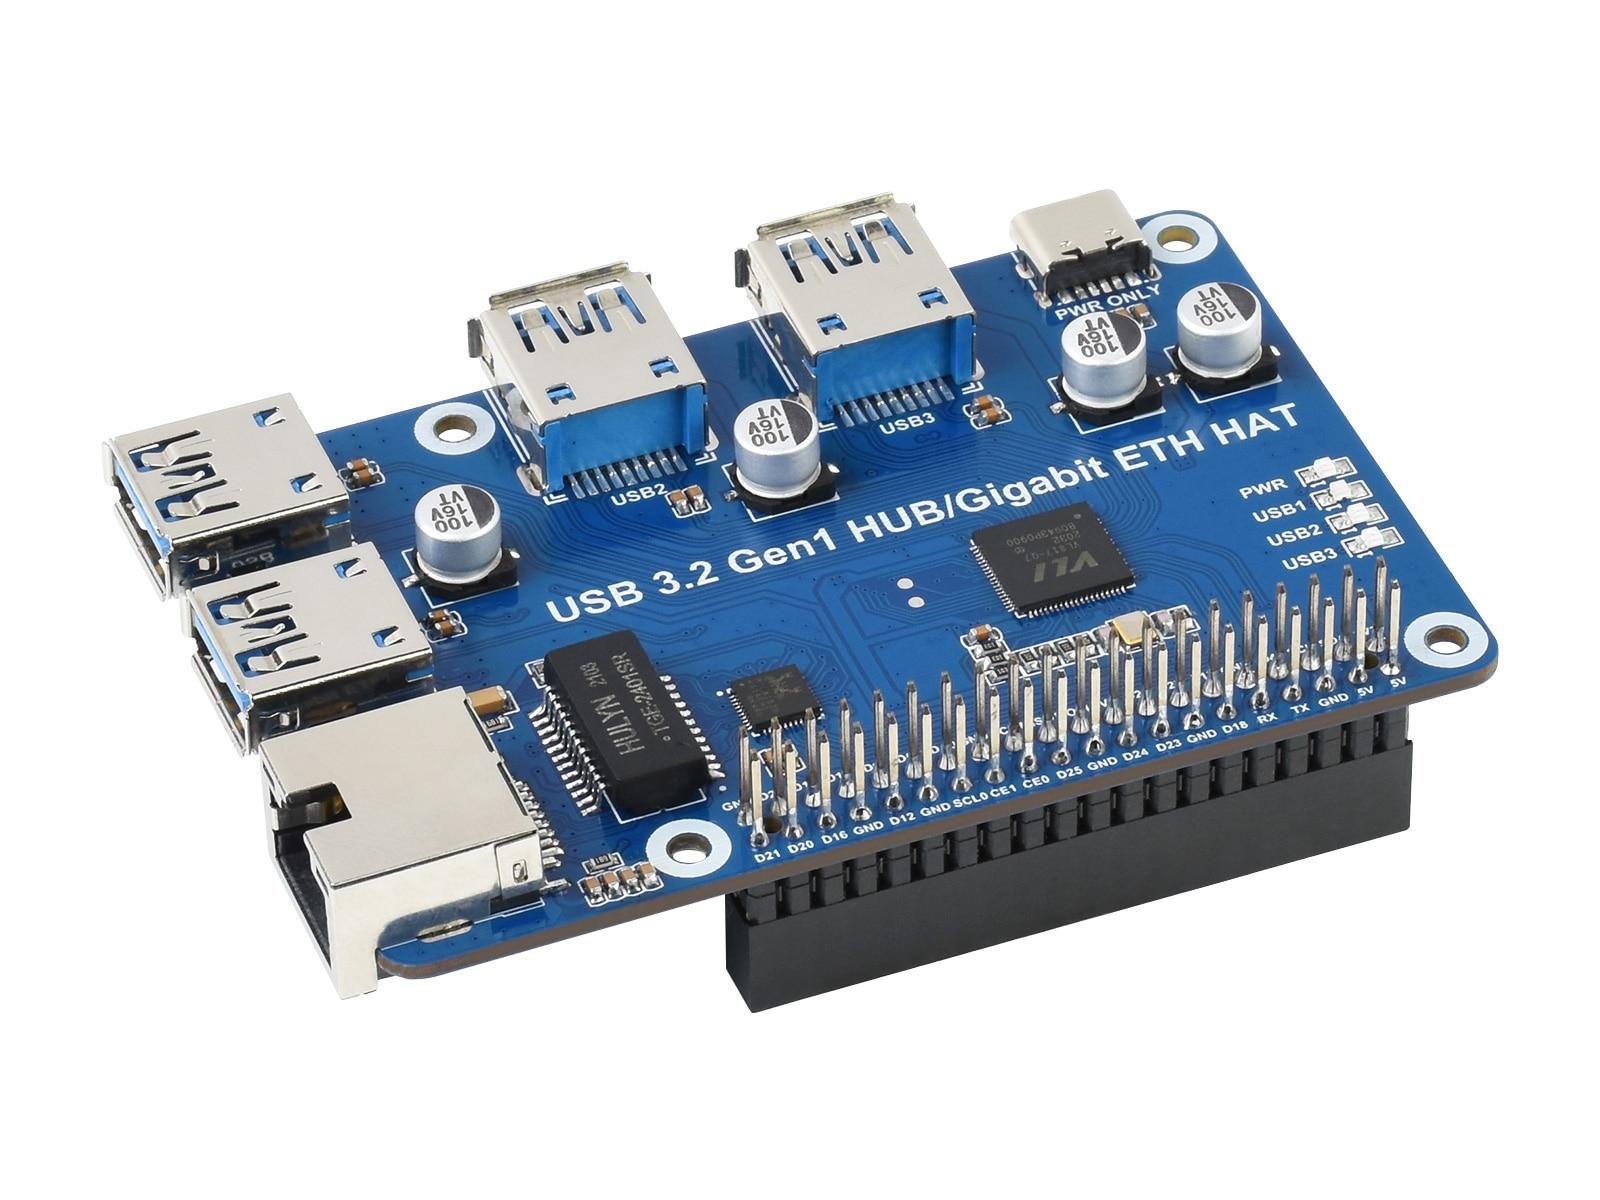 USB 3.2 Gen1 HUB جيجابت ETH قبعة ، لتوت العليق Pi ، 3x USB 3.2 Gen1 ، 1x جيجابت إيثرنت ، سائق خالية